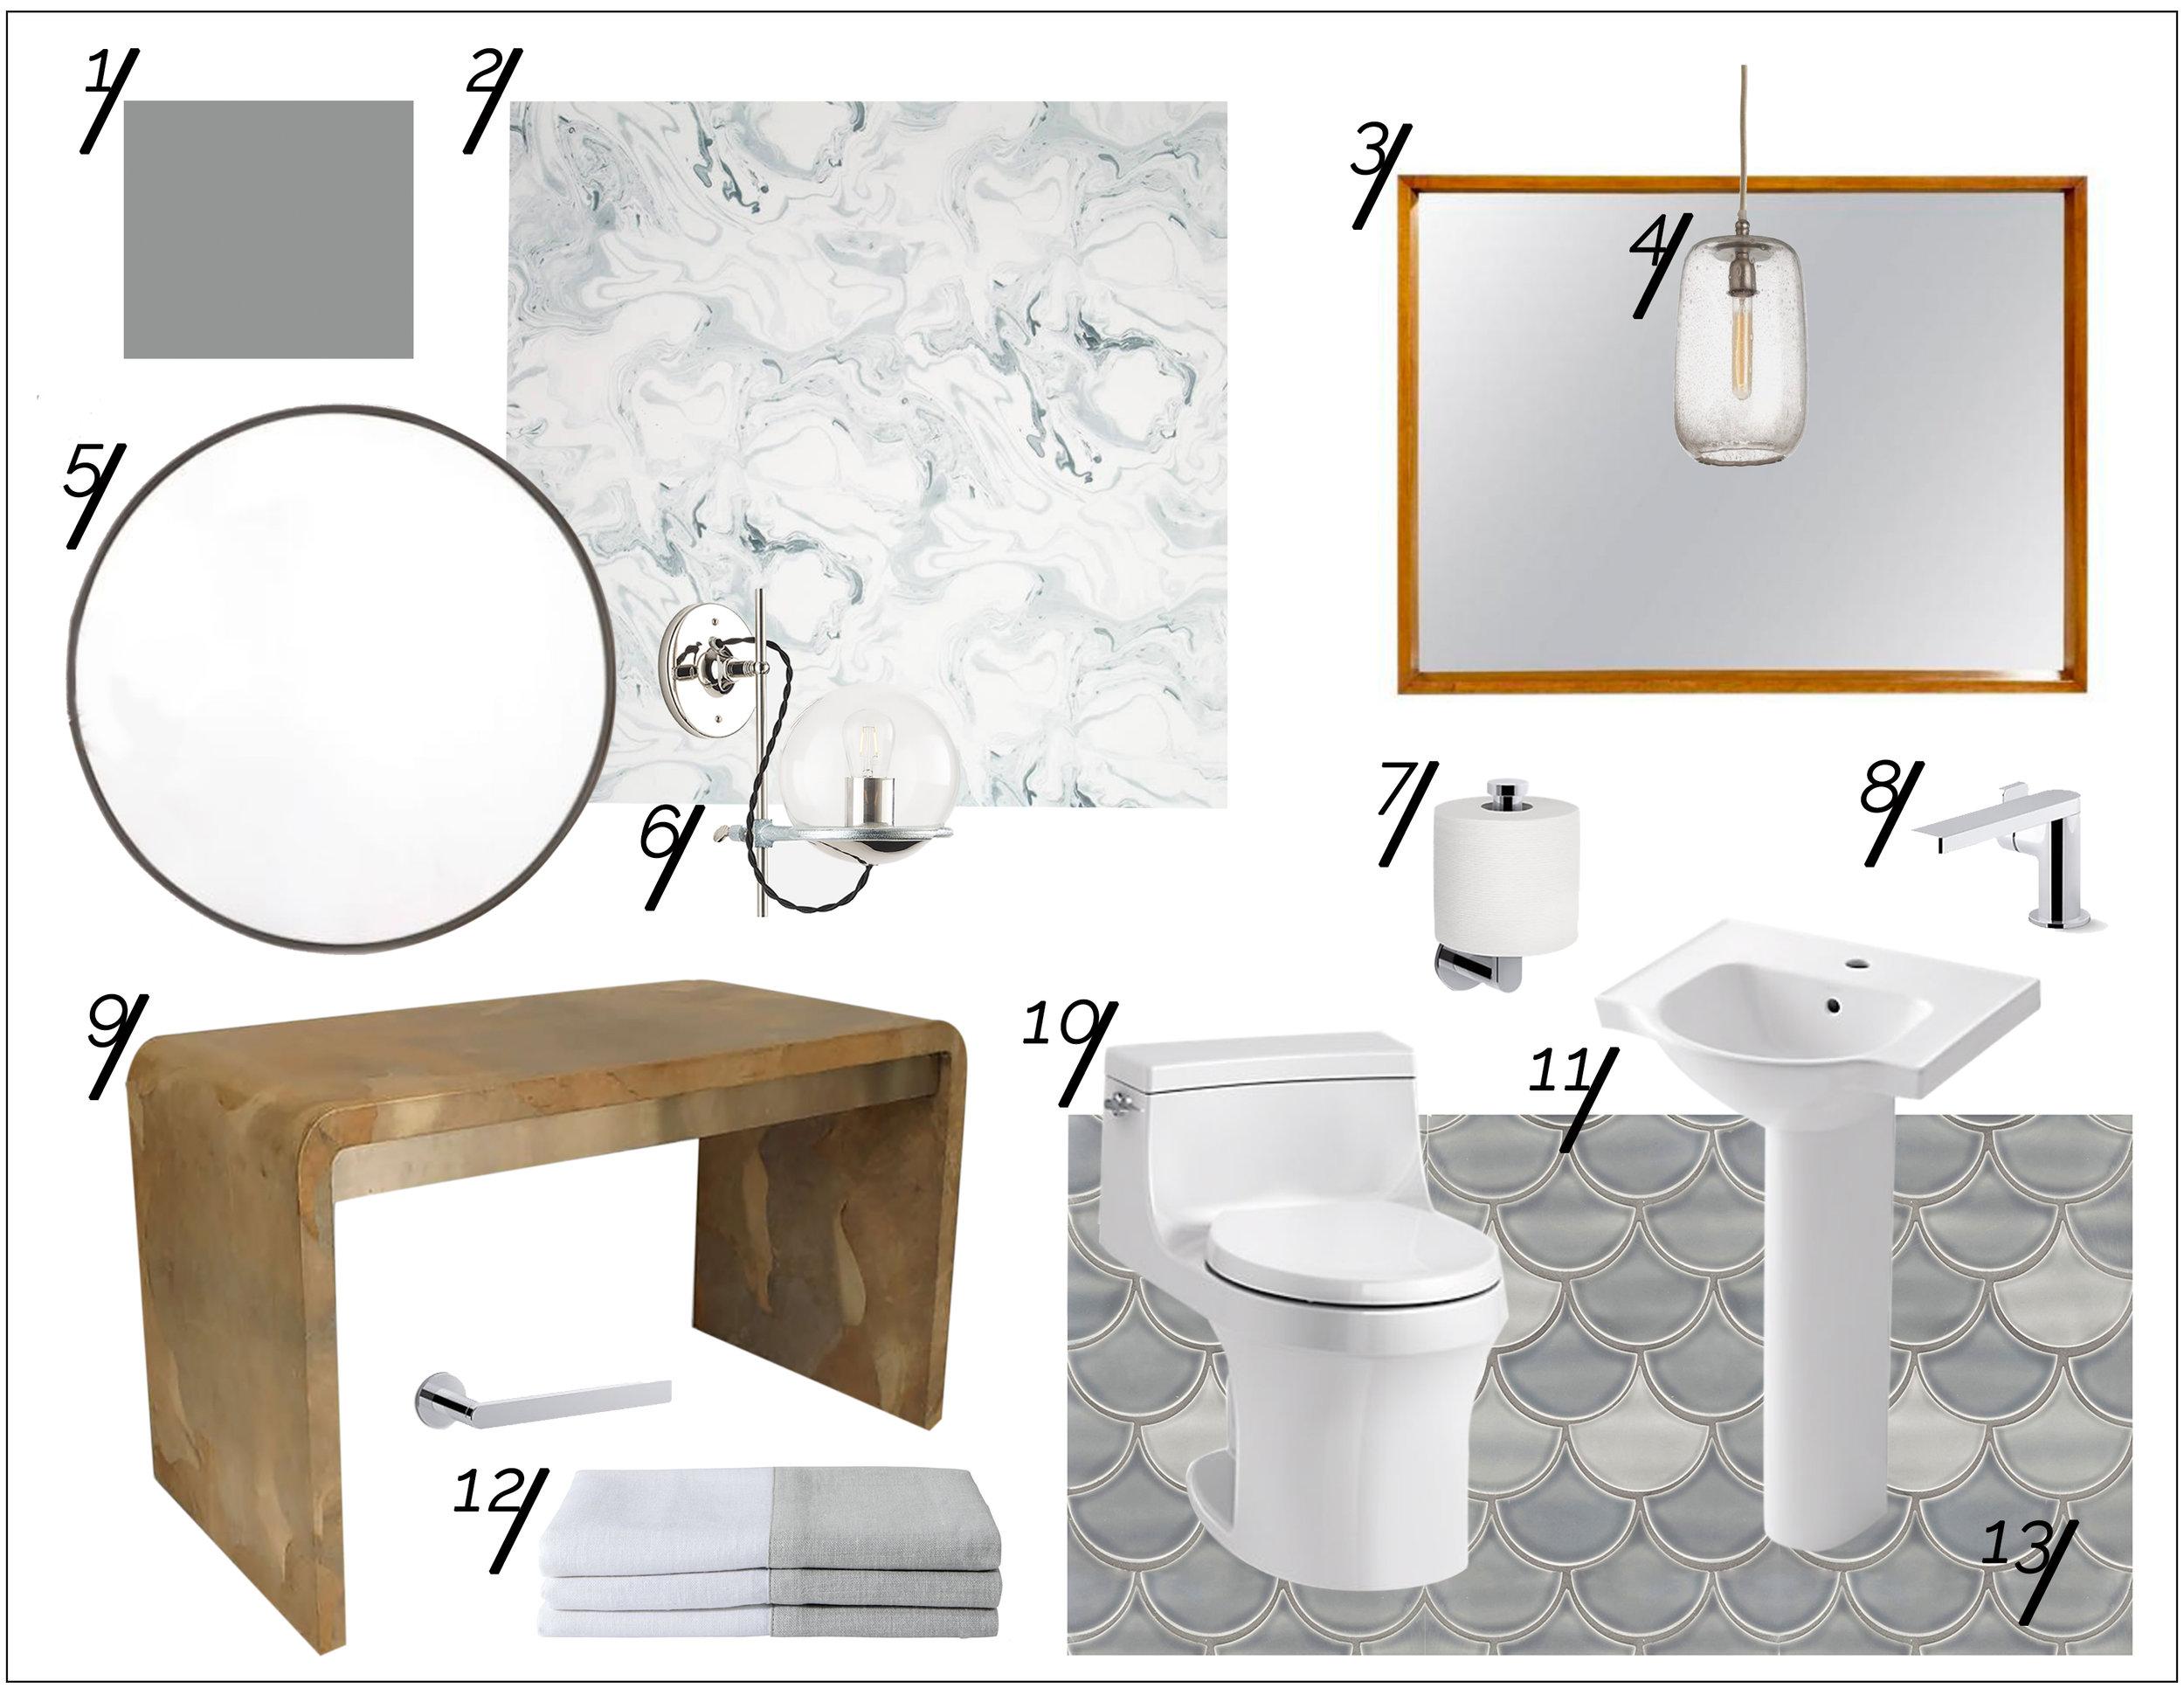 Powder Room Tranquility Shopping Guide  xo, Ebright Design